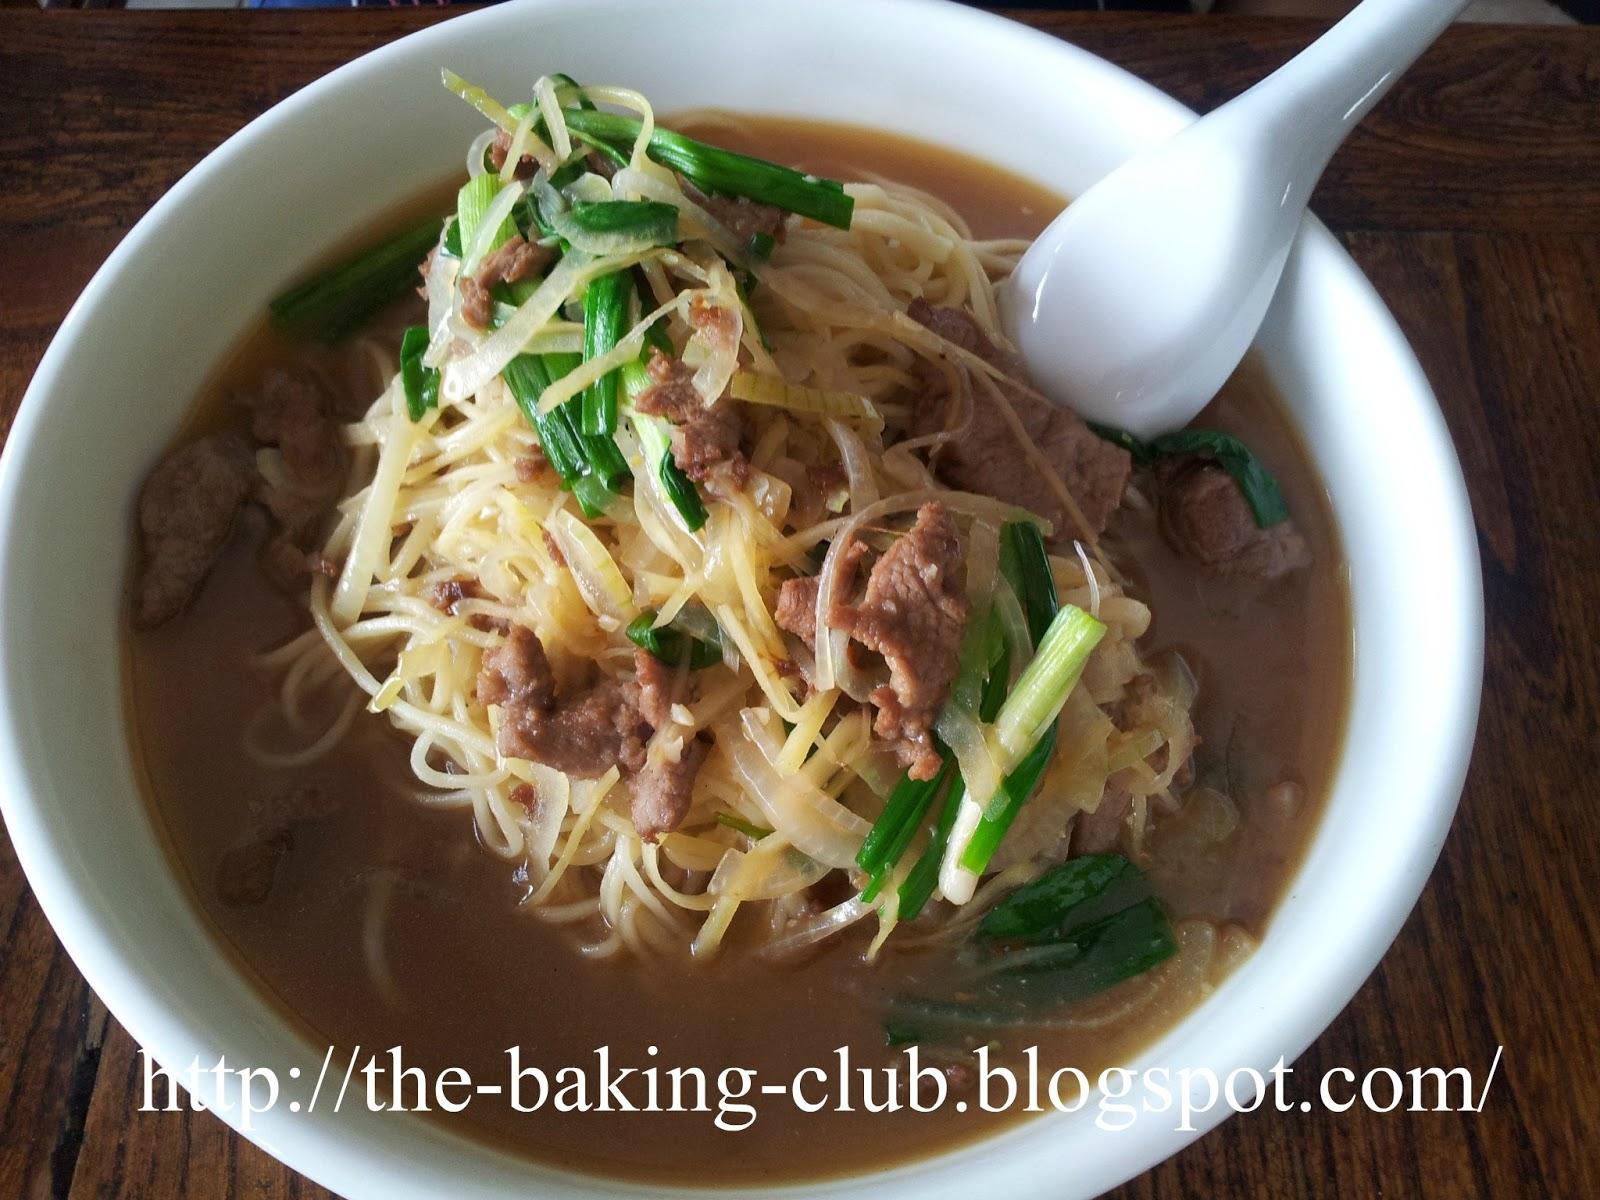 THE BAKING CLUB by Adeline Wong: GOOD FOOD KOTA KINABALU - HE JIA FU ...